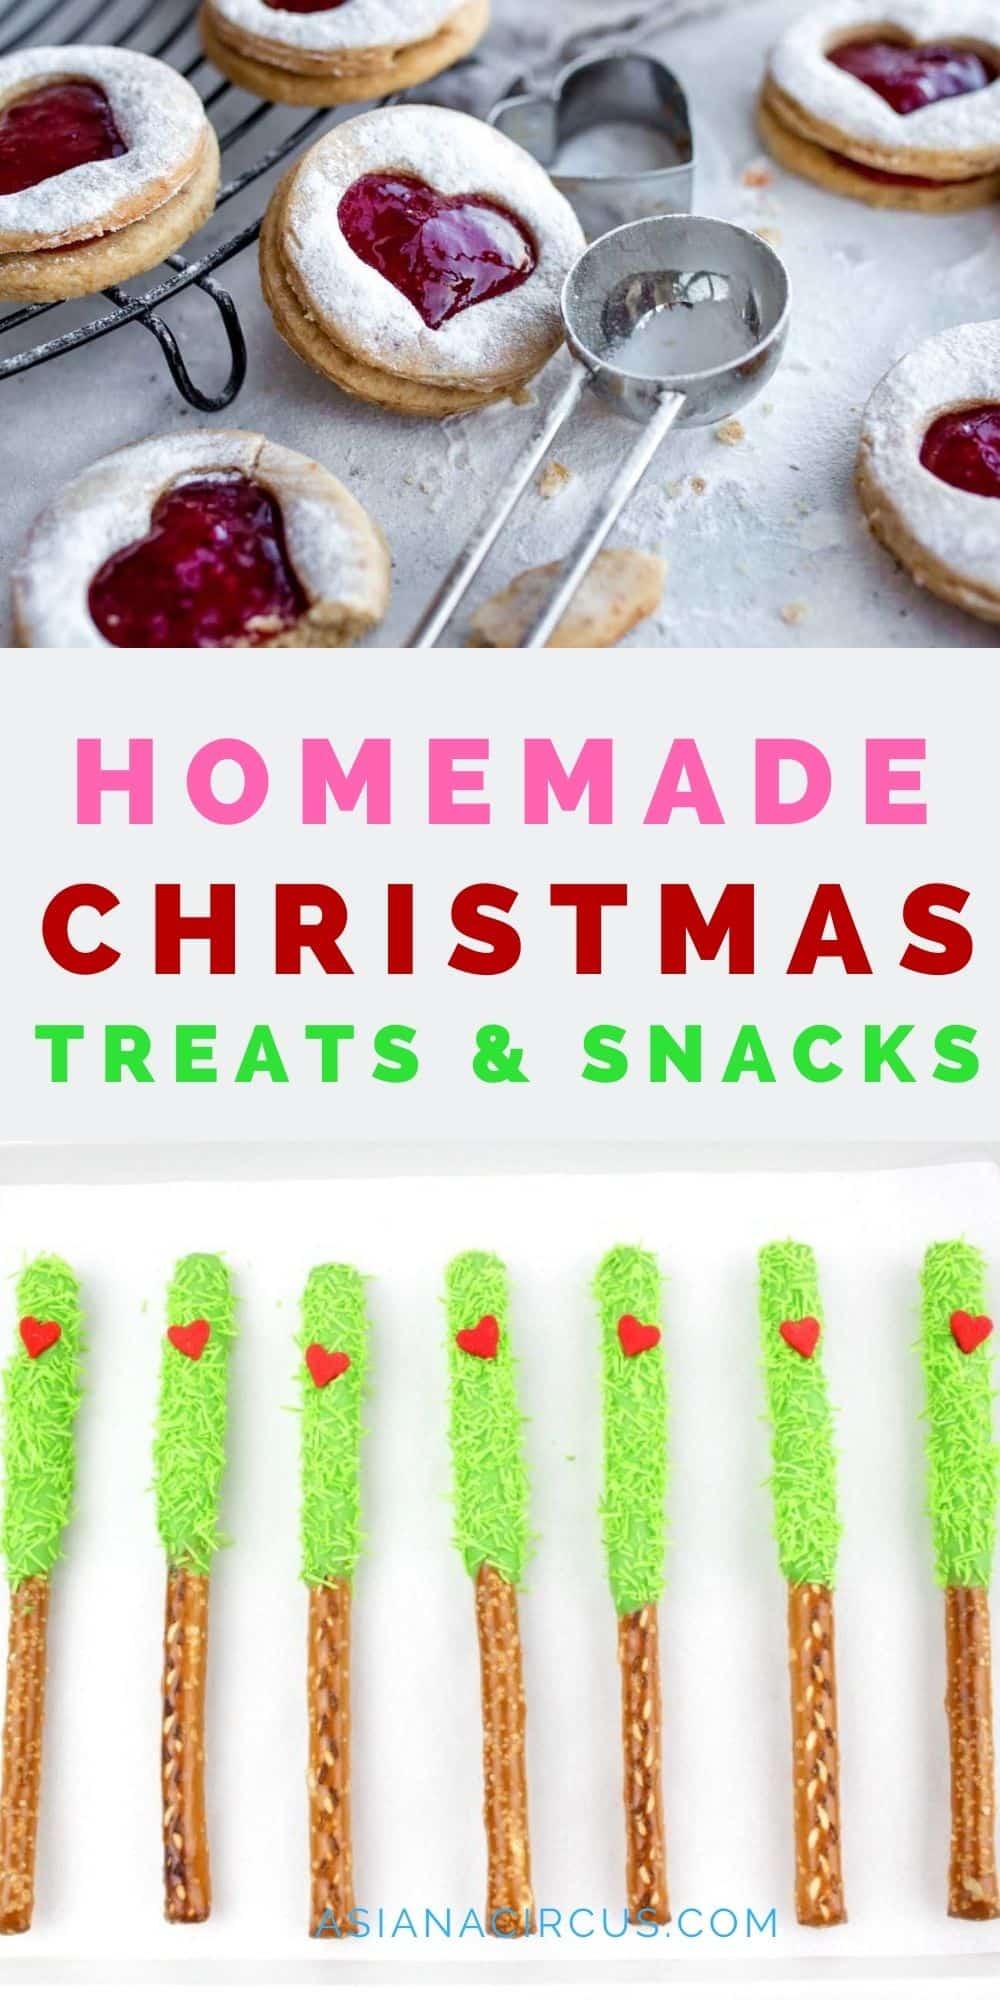 Homemade Christmas treats & snacks